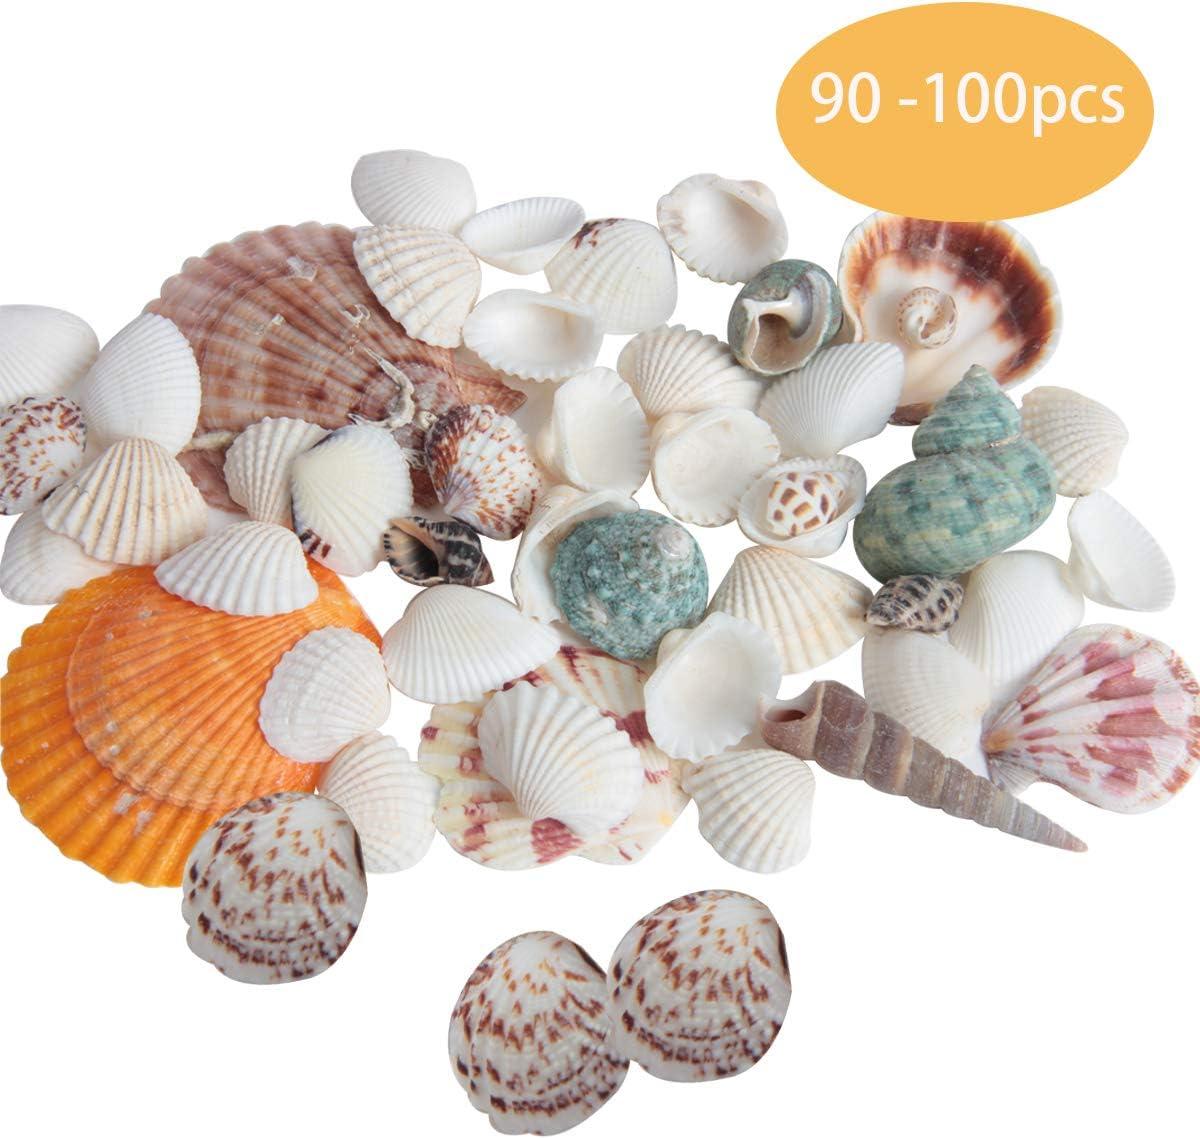 Hapy Shop Sea Shells Mixed Beach Seashells Starfish, Various Sizes Natural Seashells for Beach Theme Party,Fish Tank, Home Decorations, Wedding Decorations DIY Crafts 90+ pcs